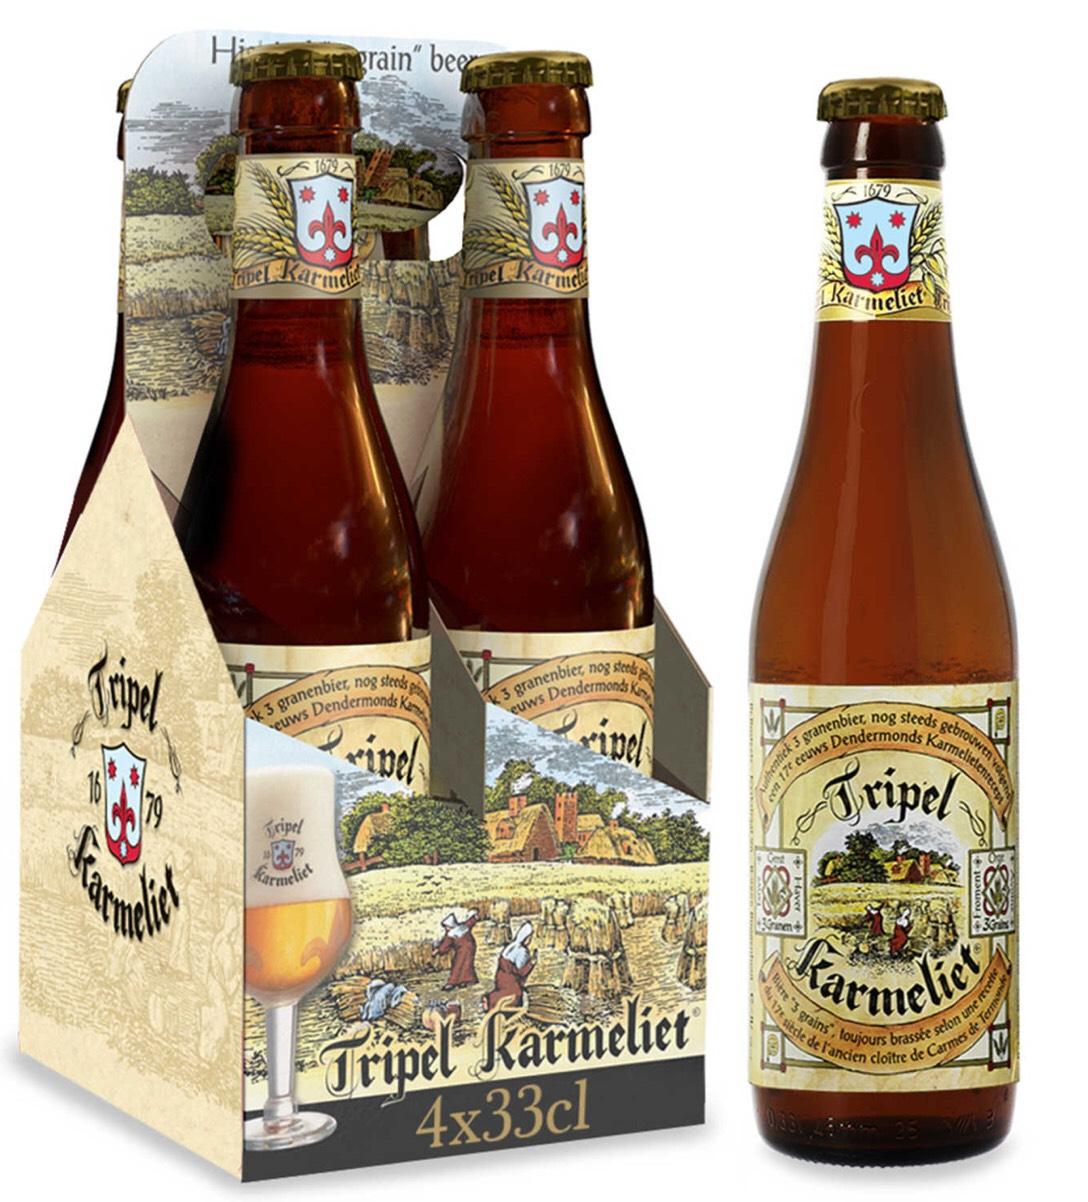 3x 4-pack Karmeliet Tripel, Pauwel Kwak, Hertog Jan voor 10,-